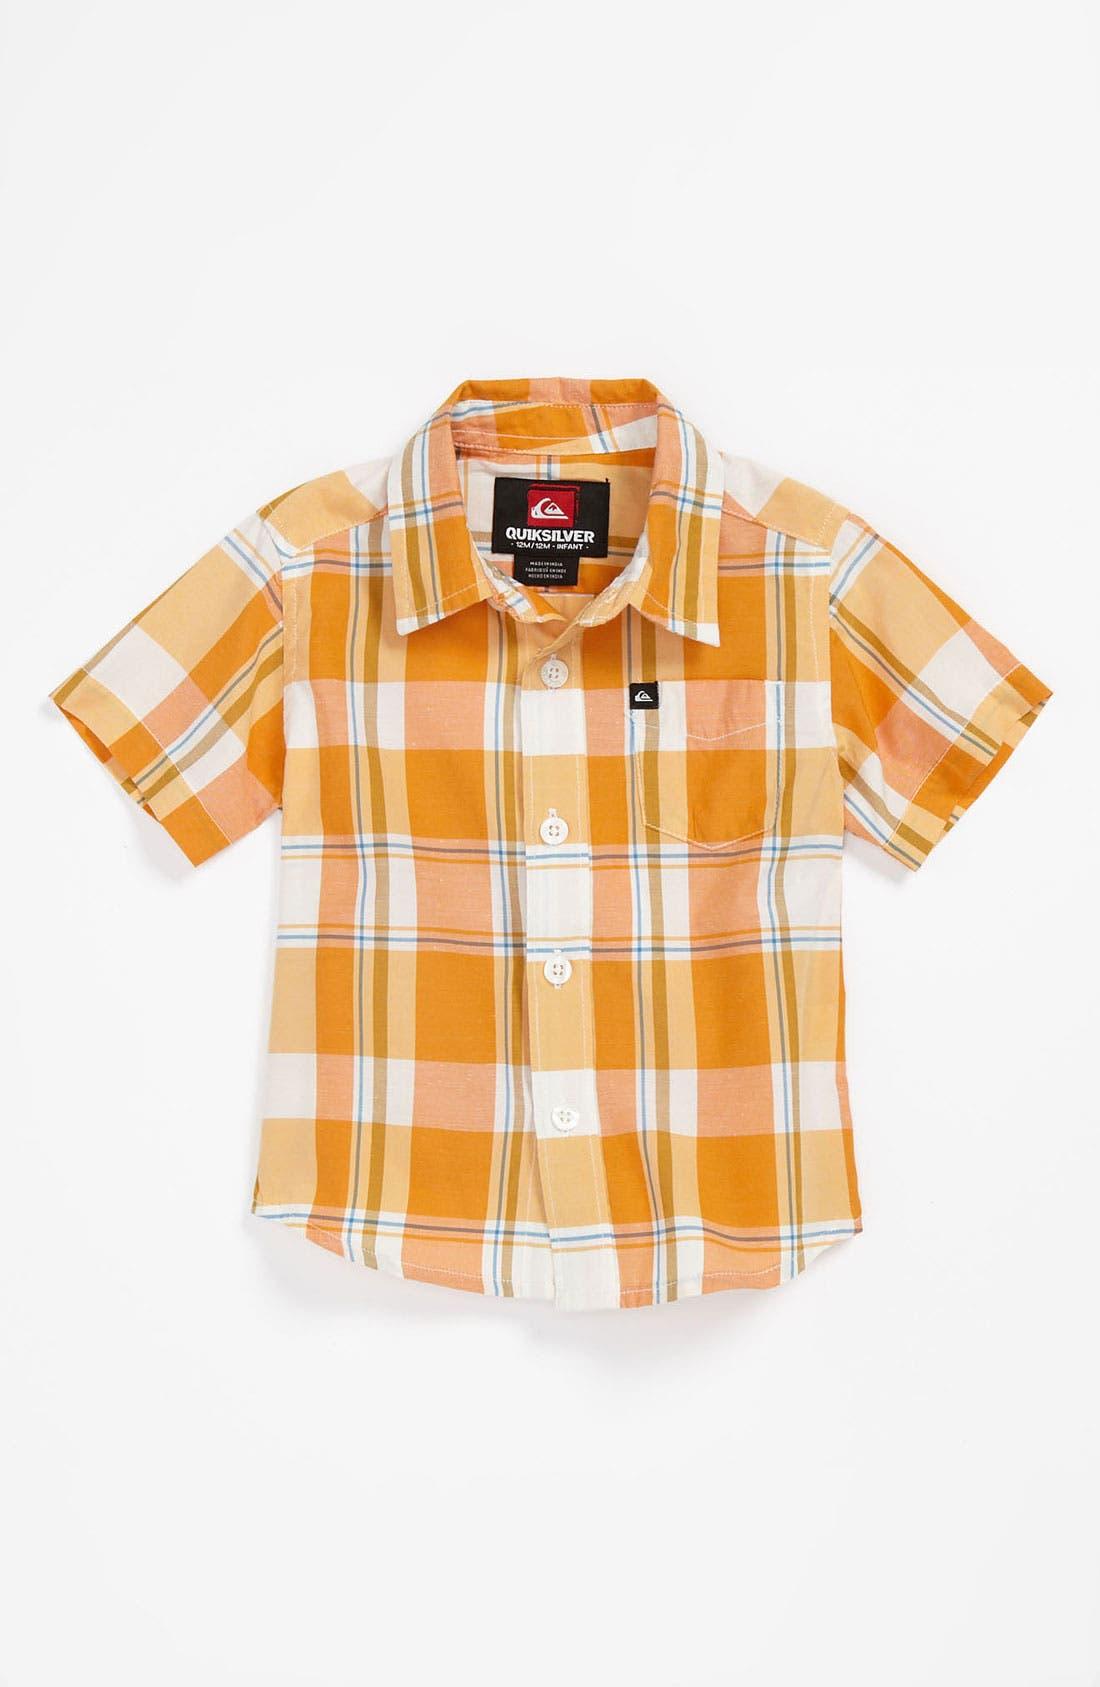 Main Image - Quiksilver 'Pat' Plaid Shirt (Baby)